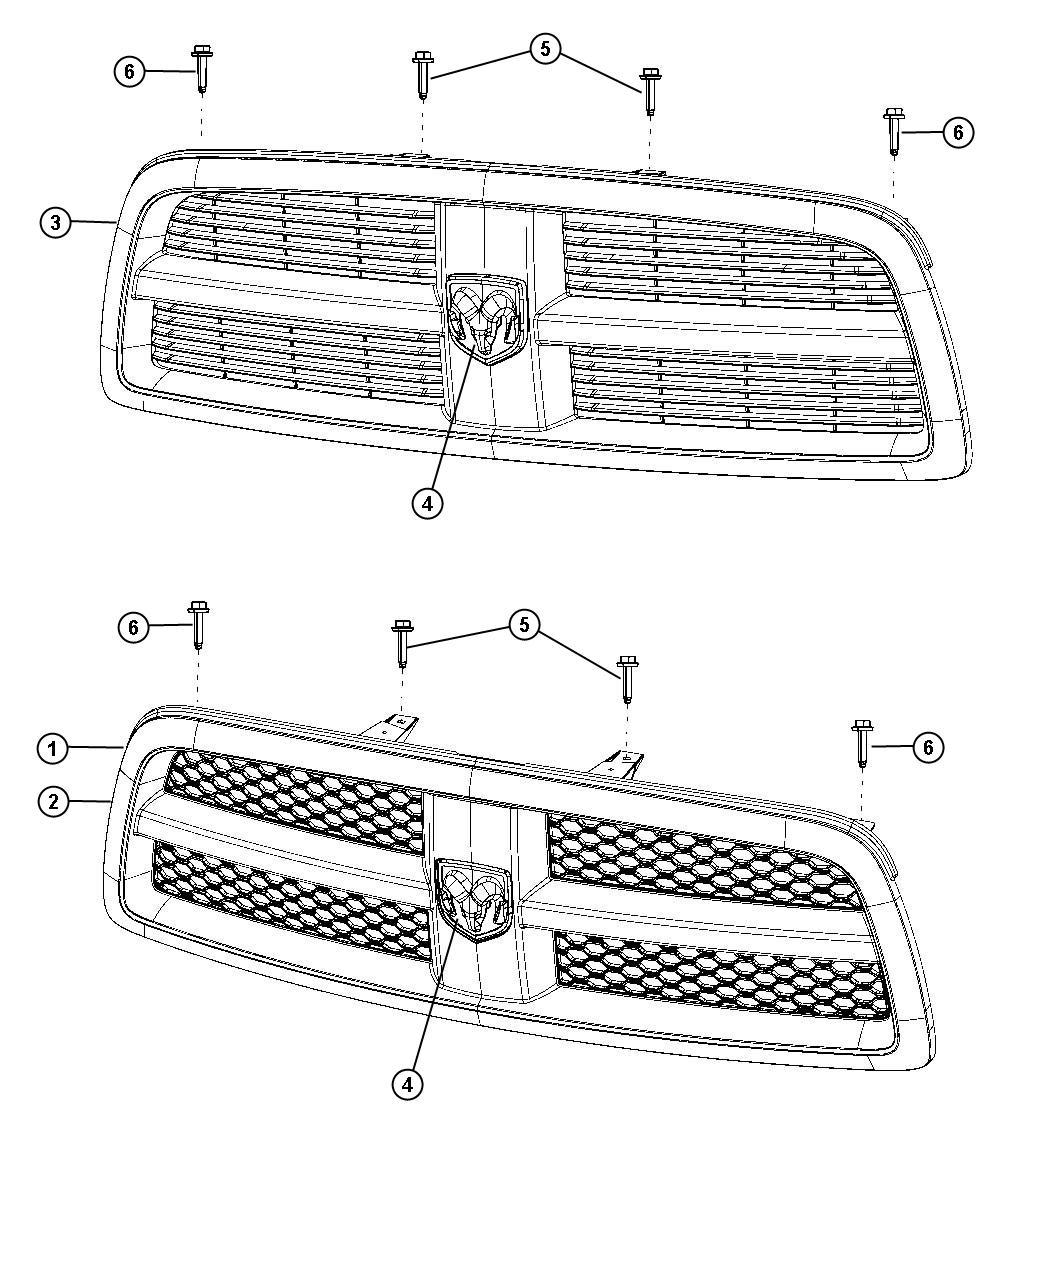 2012 dodge ram 1500 grille  radiator  color